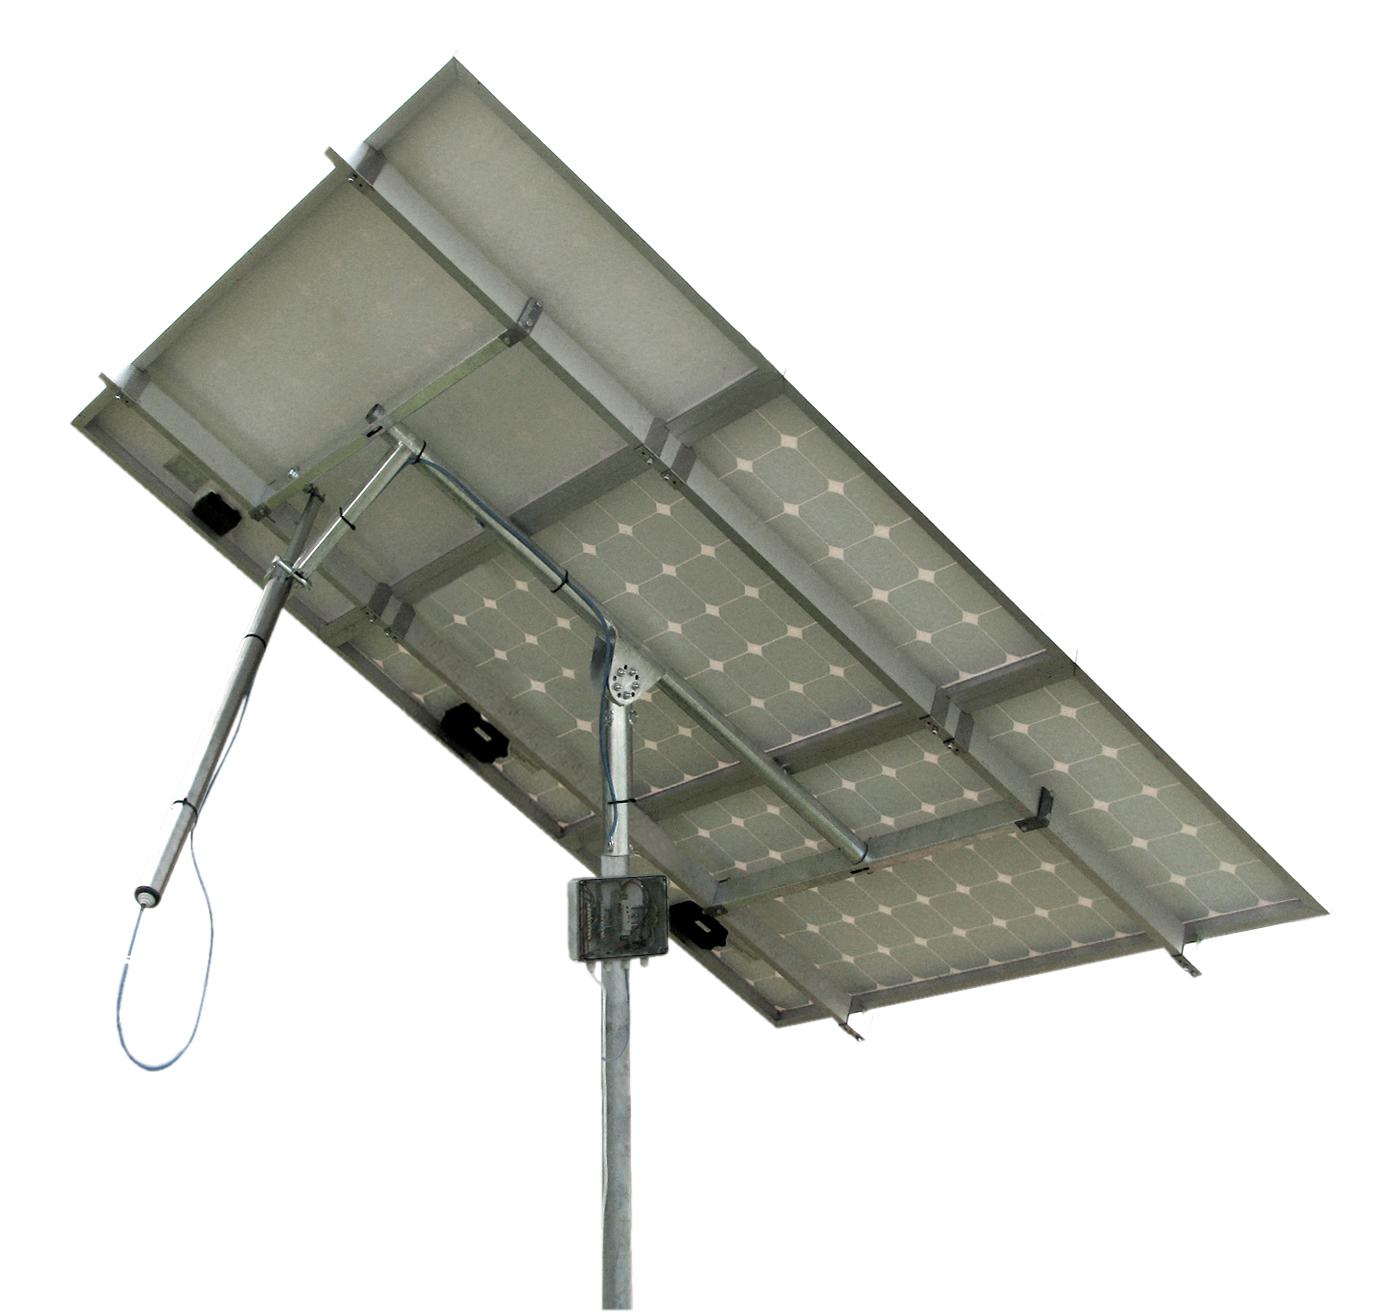 Solar Tracker Amp Sun Tracker Gt Solar Tracker Amp Sun Tracker